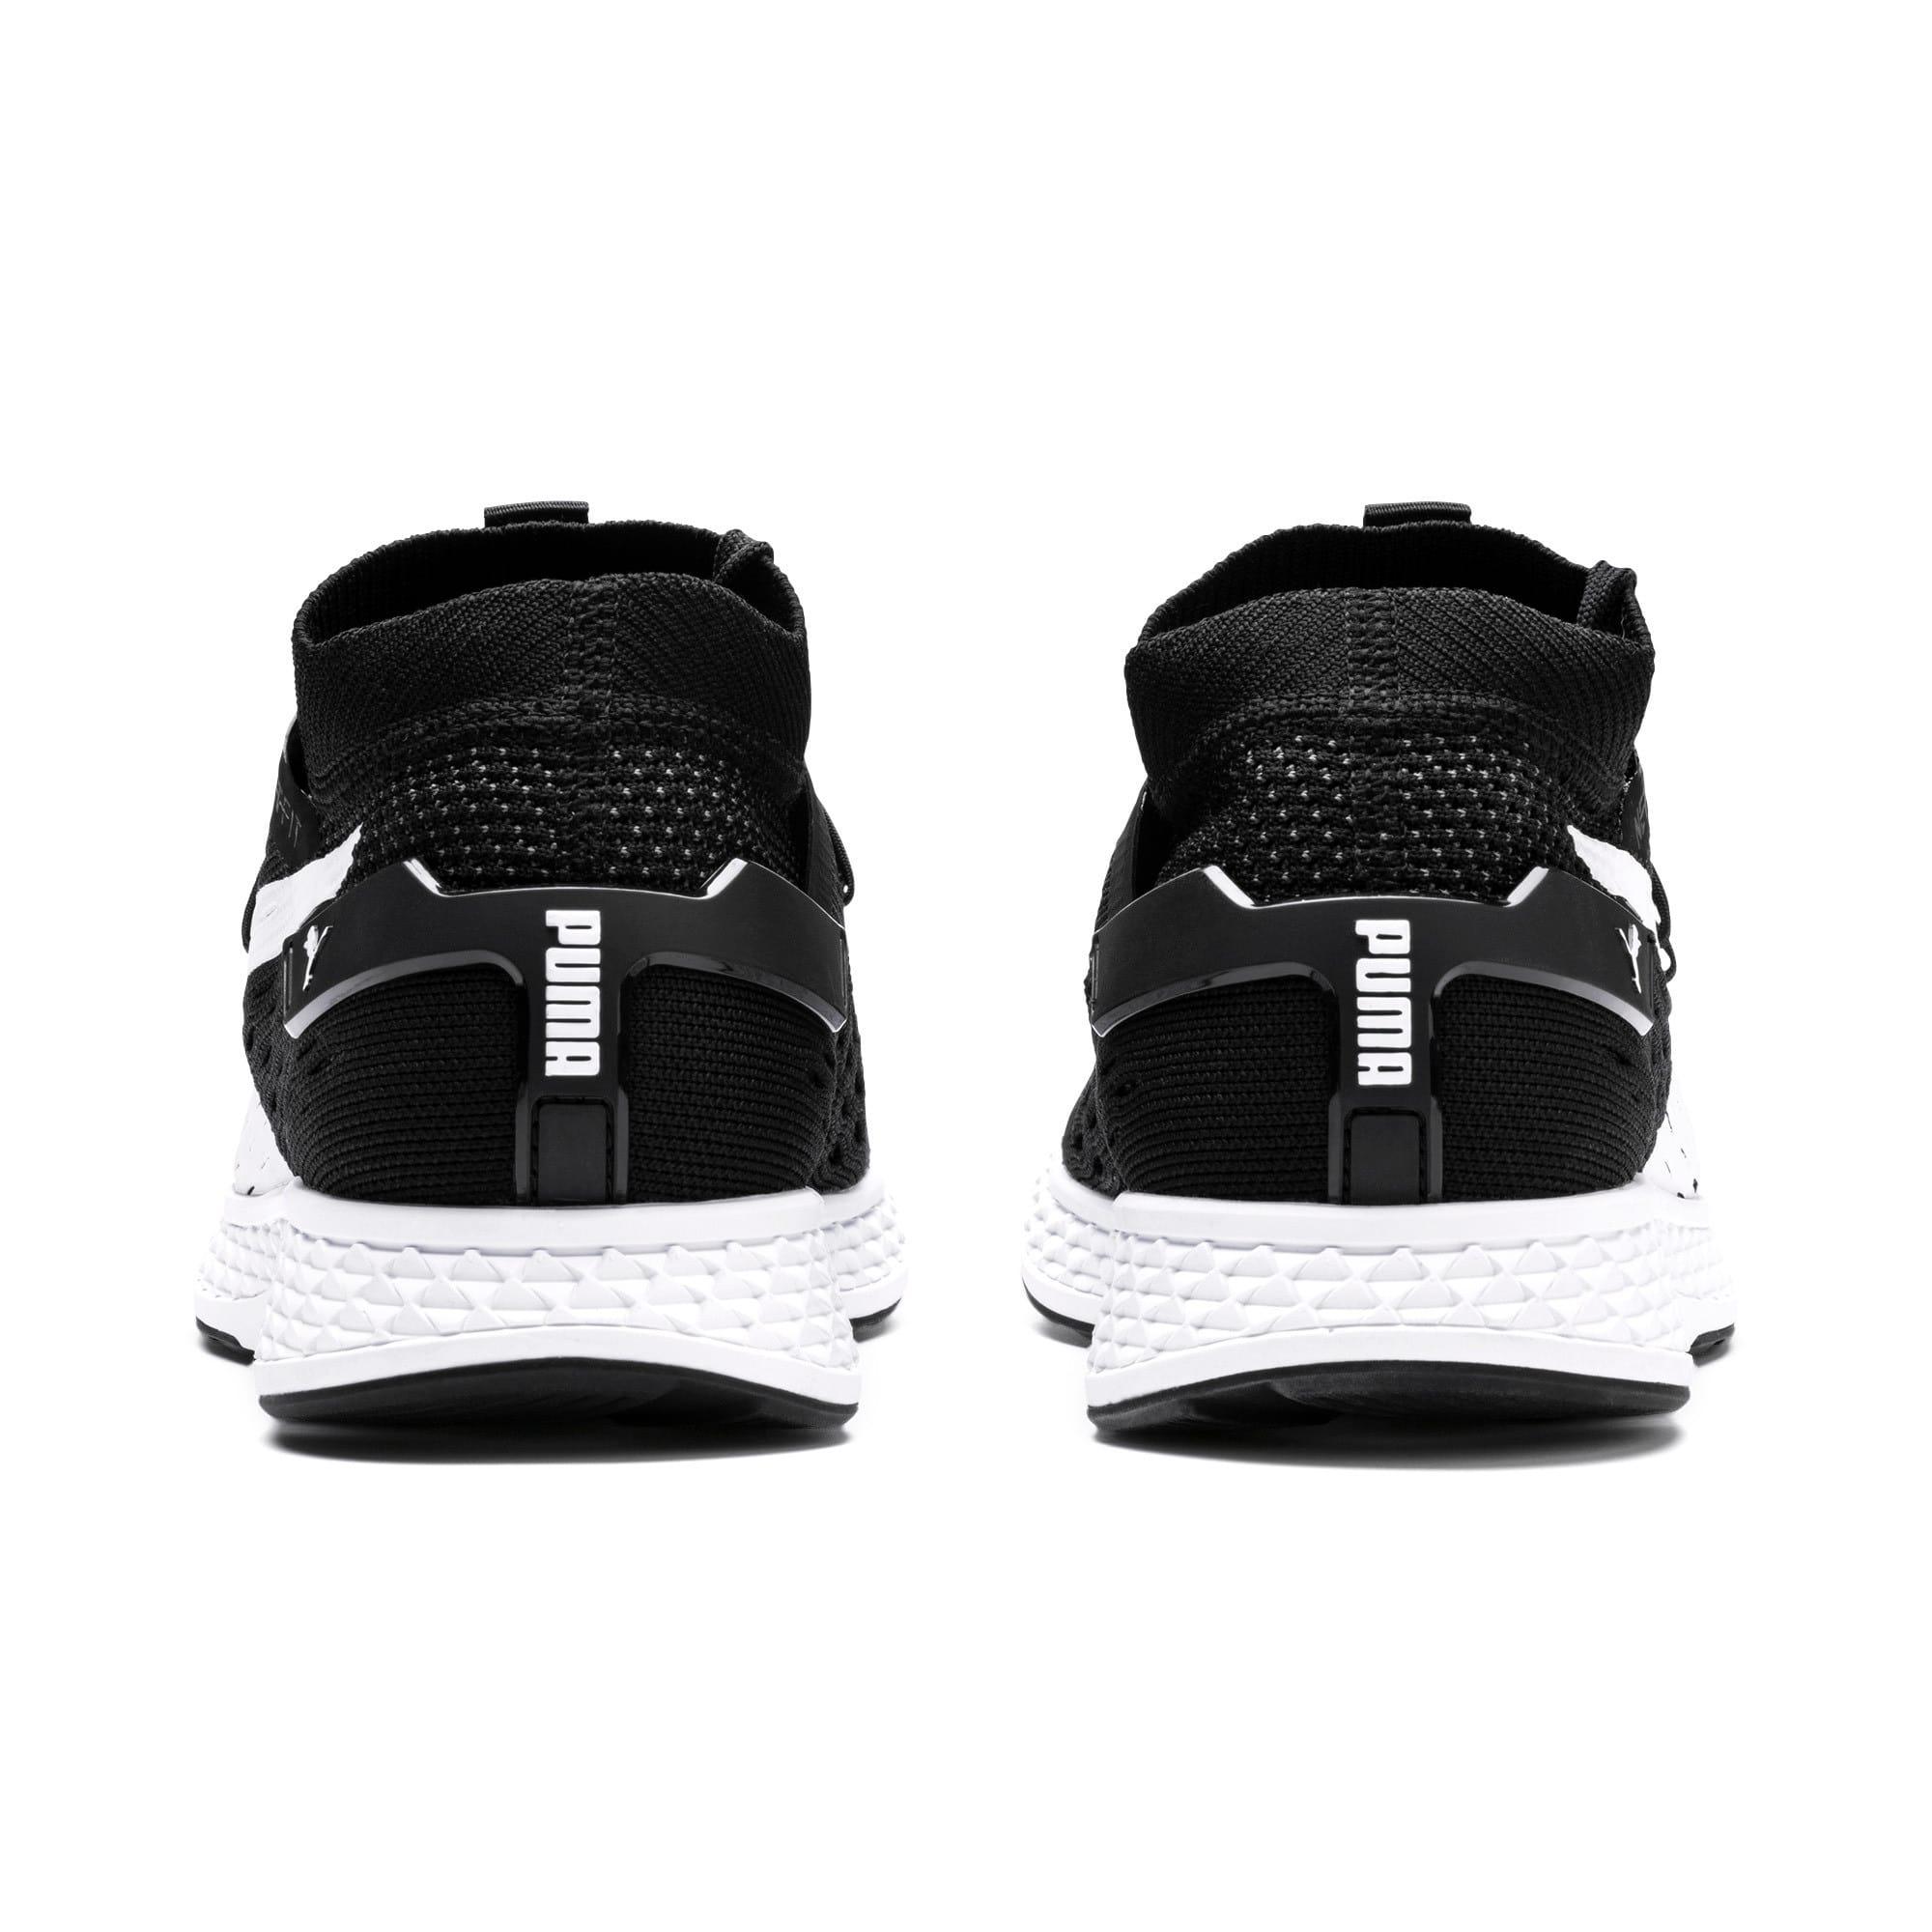 Thumbnail 4 of SPEED 500 Men's Running Shoes, Puma Black-Puma White, medium